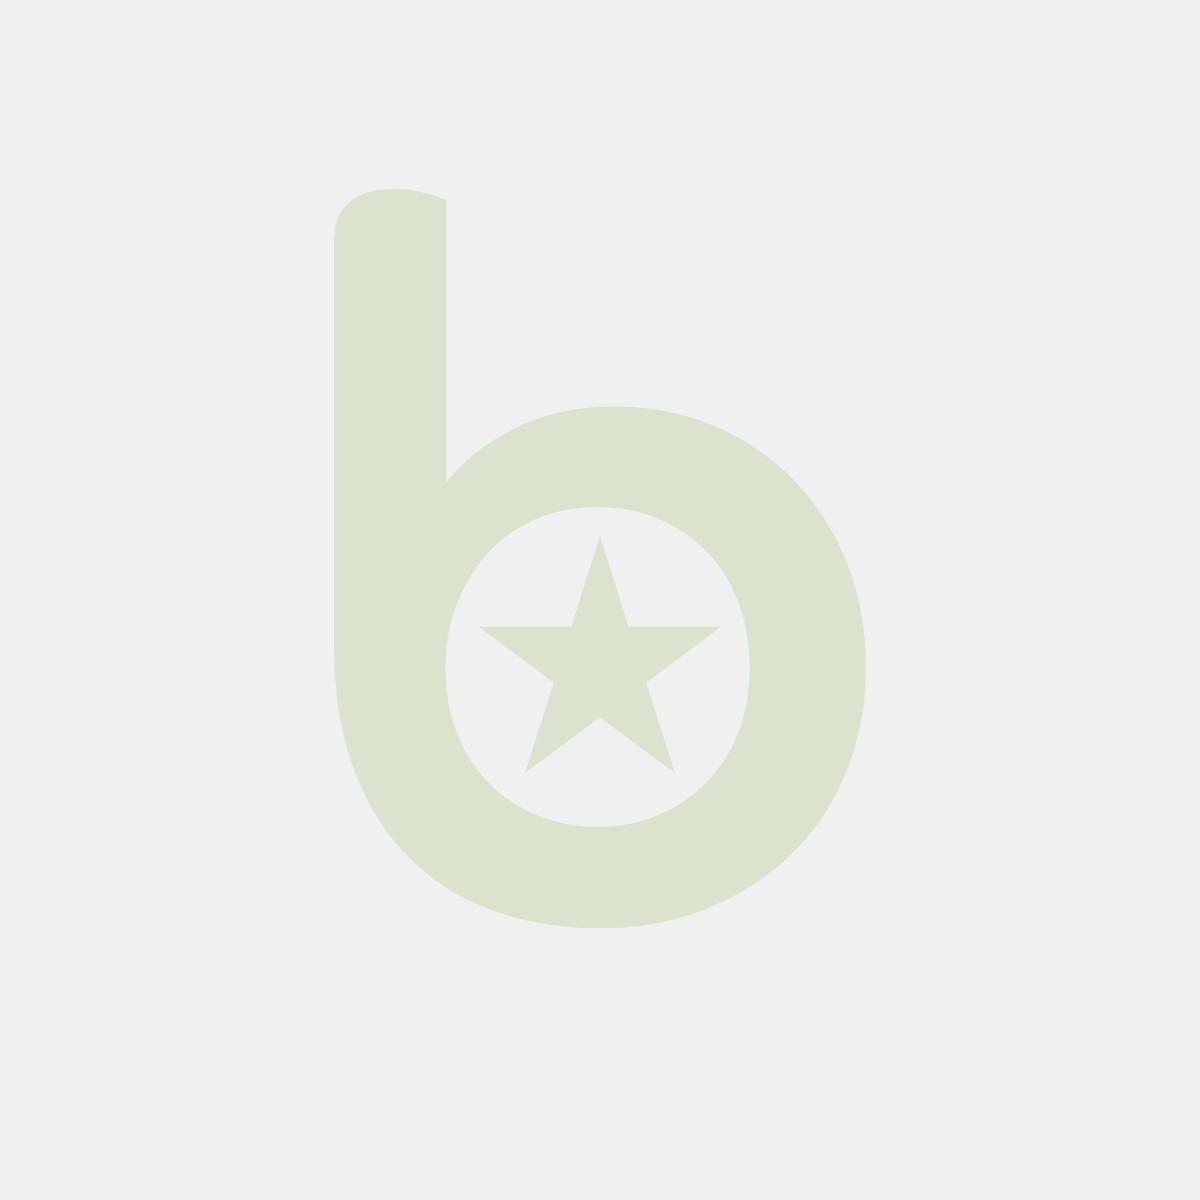 FINGERFOOD - garnek srebro/biel 45ml okrągły, fi.5x8,9xh.3,1cm, PS op. 24 sztuki